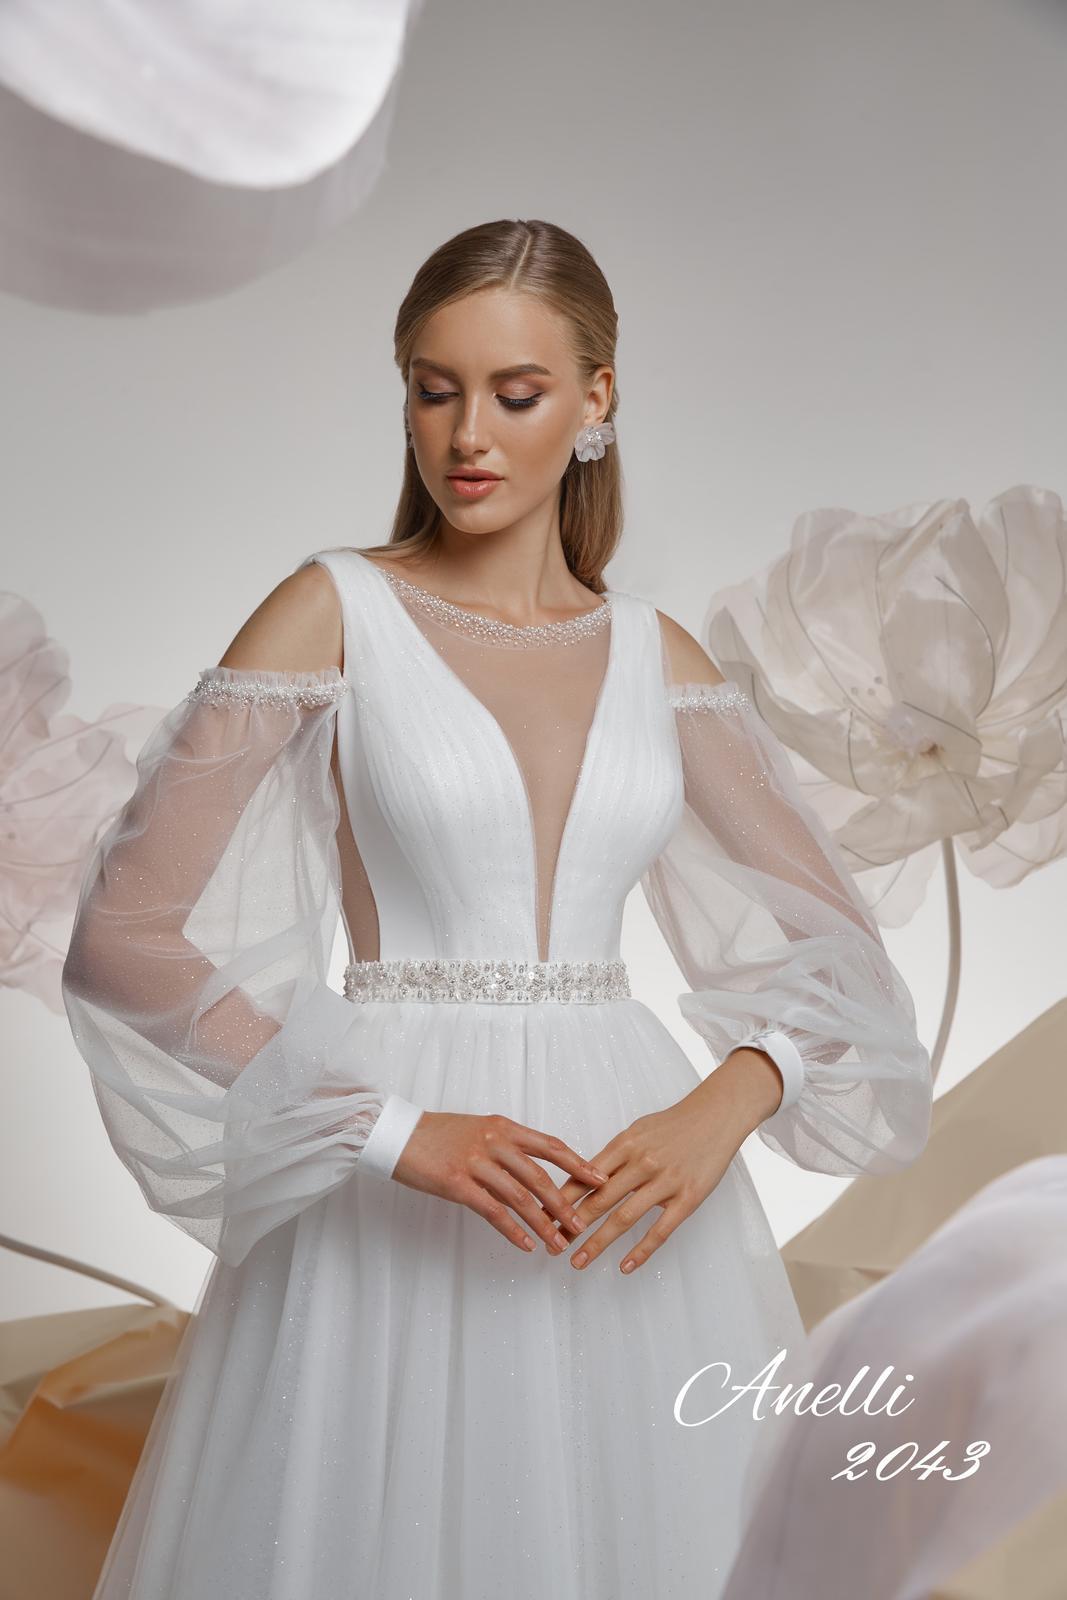 Svadobné šaty - Imagine 2043 - Obrázok č. 3